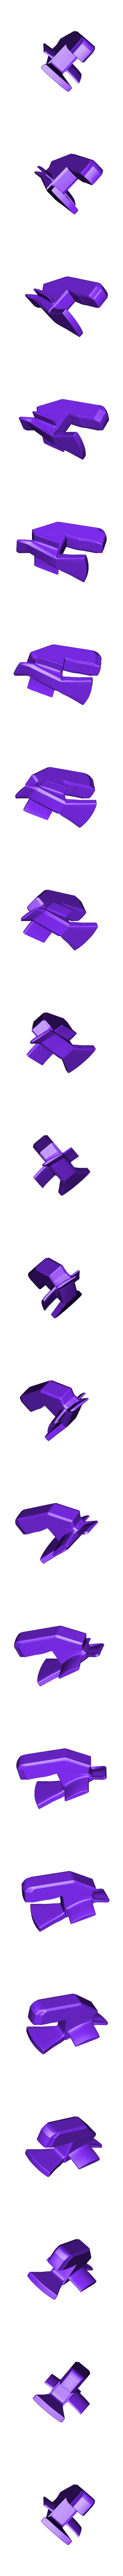 Lucio_tab_lft.stl Download free STL file Overwatch Lucio Blaster • 3D printer object, Adafruit